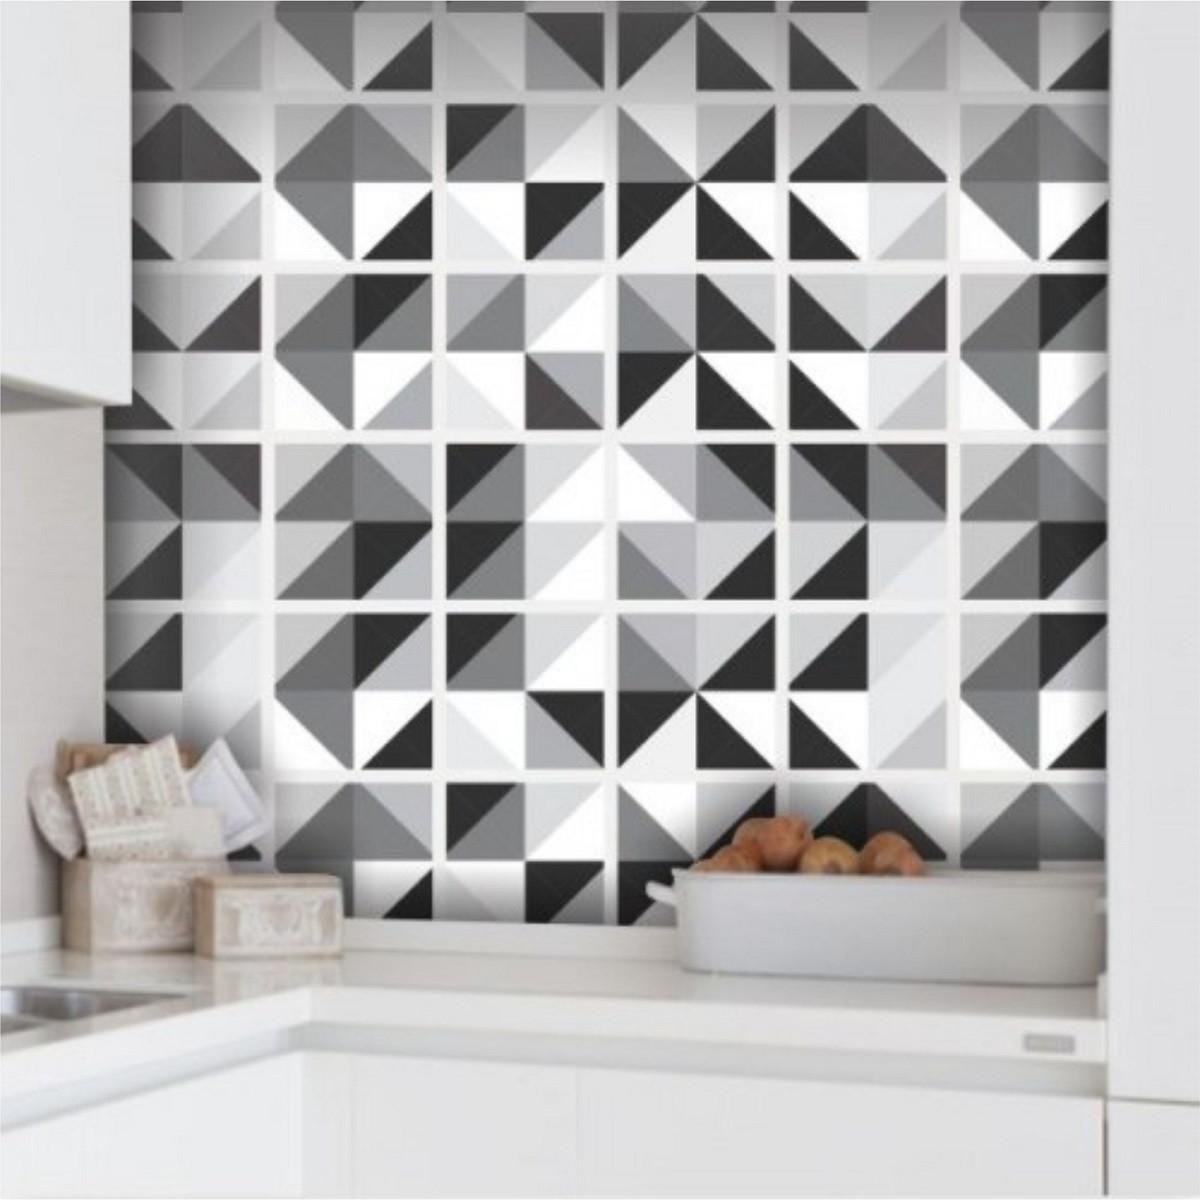 adesivos para azulejos 442 azulejos adesivos para azulejos 442 adesivo  #835E48 1200x1200 Azulejo Vinilico Banheiro